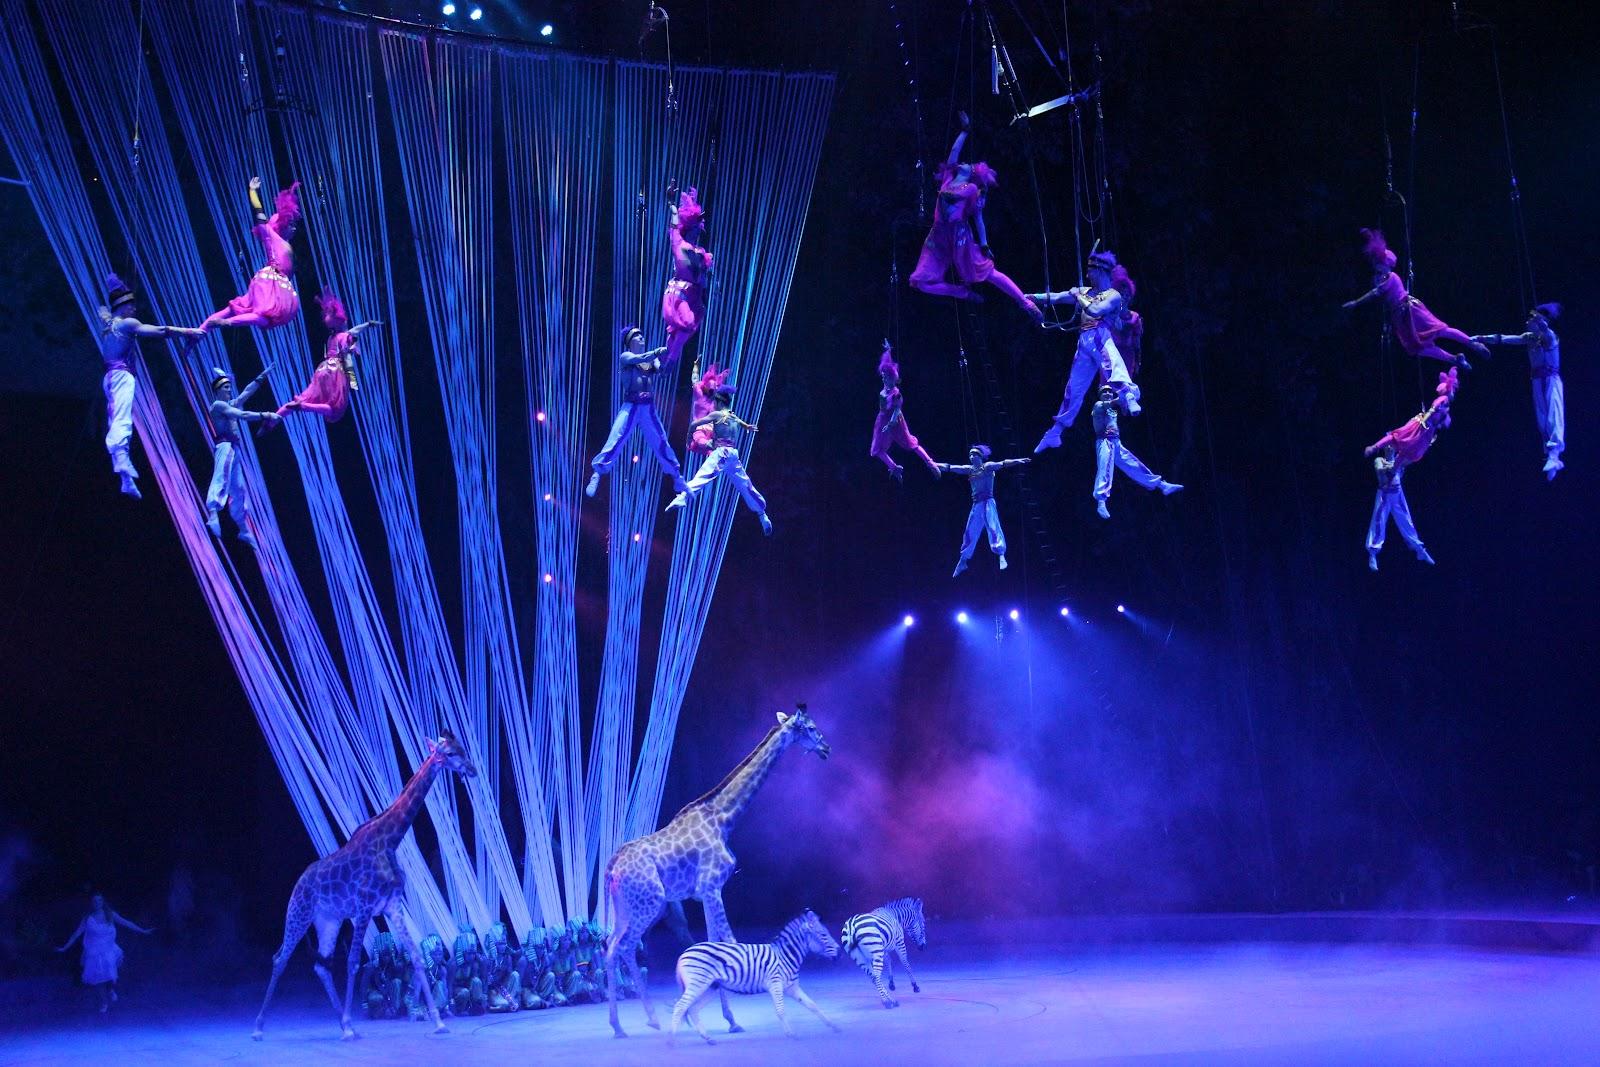 سیرک بین المللی گوانجو چین